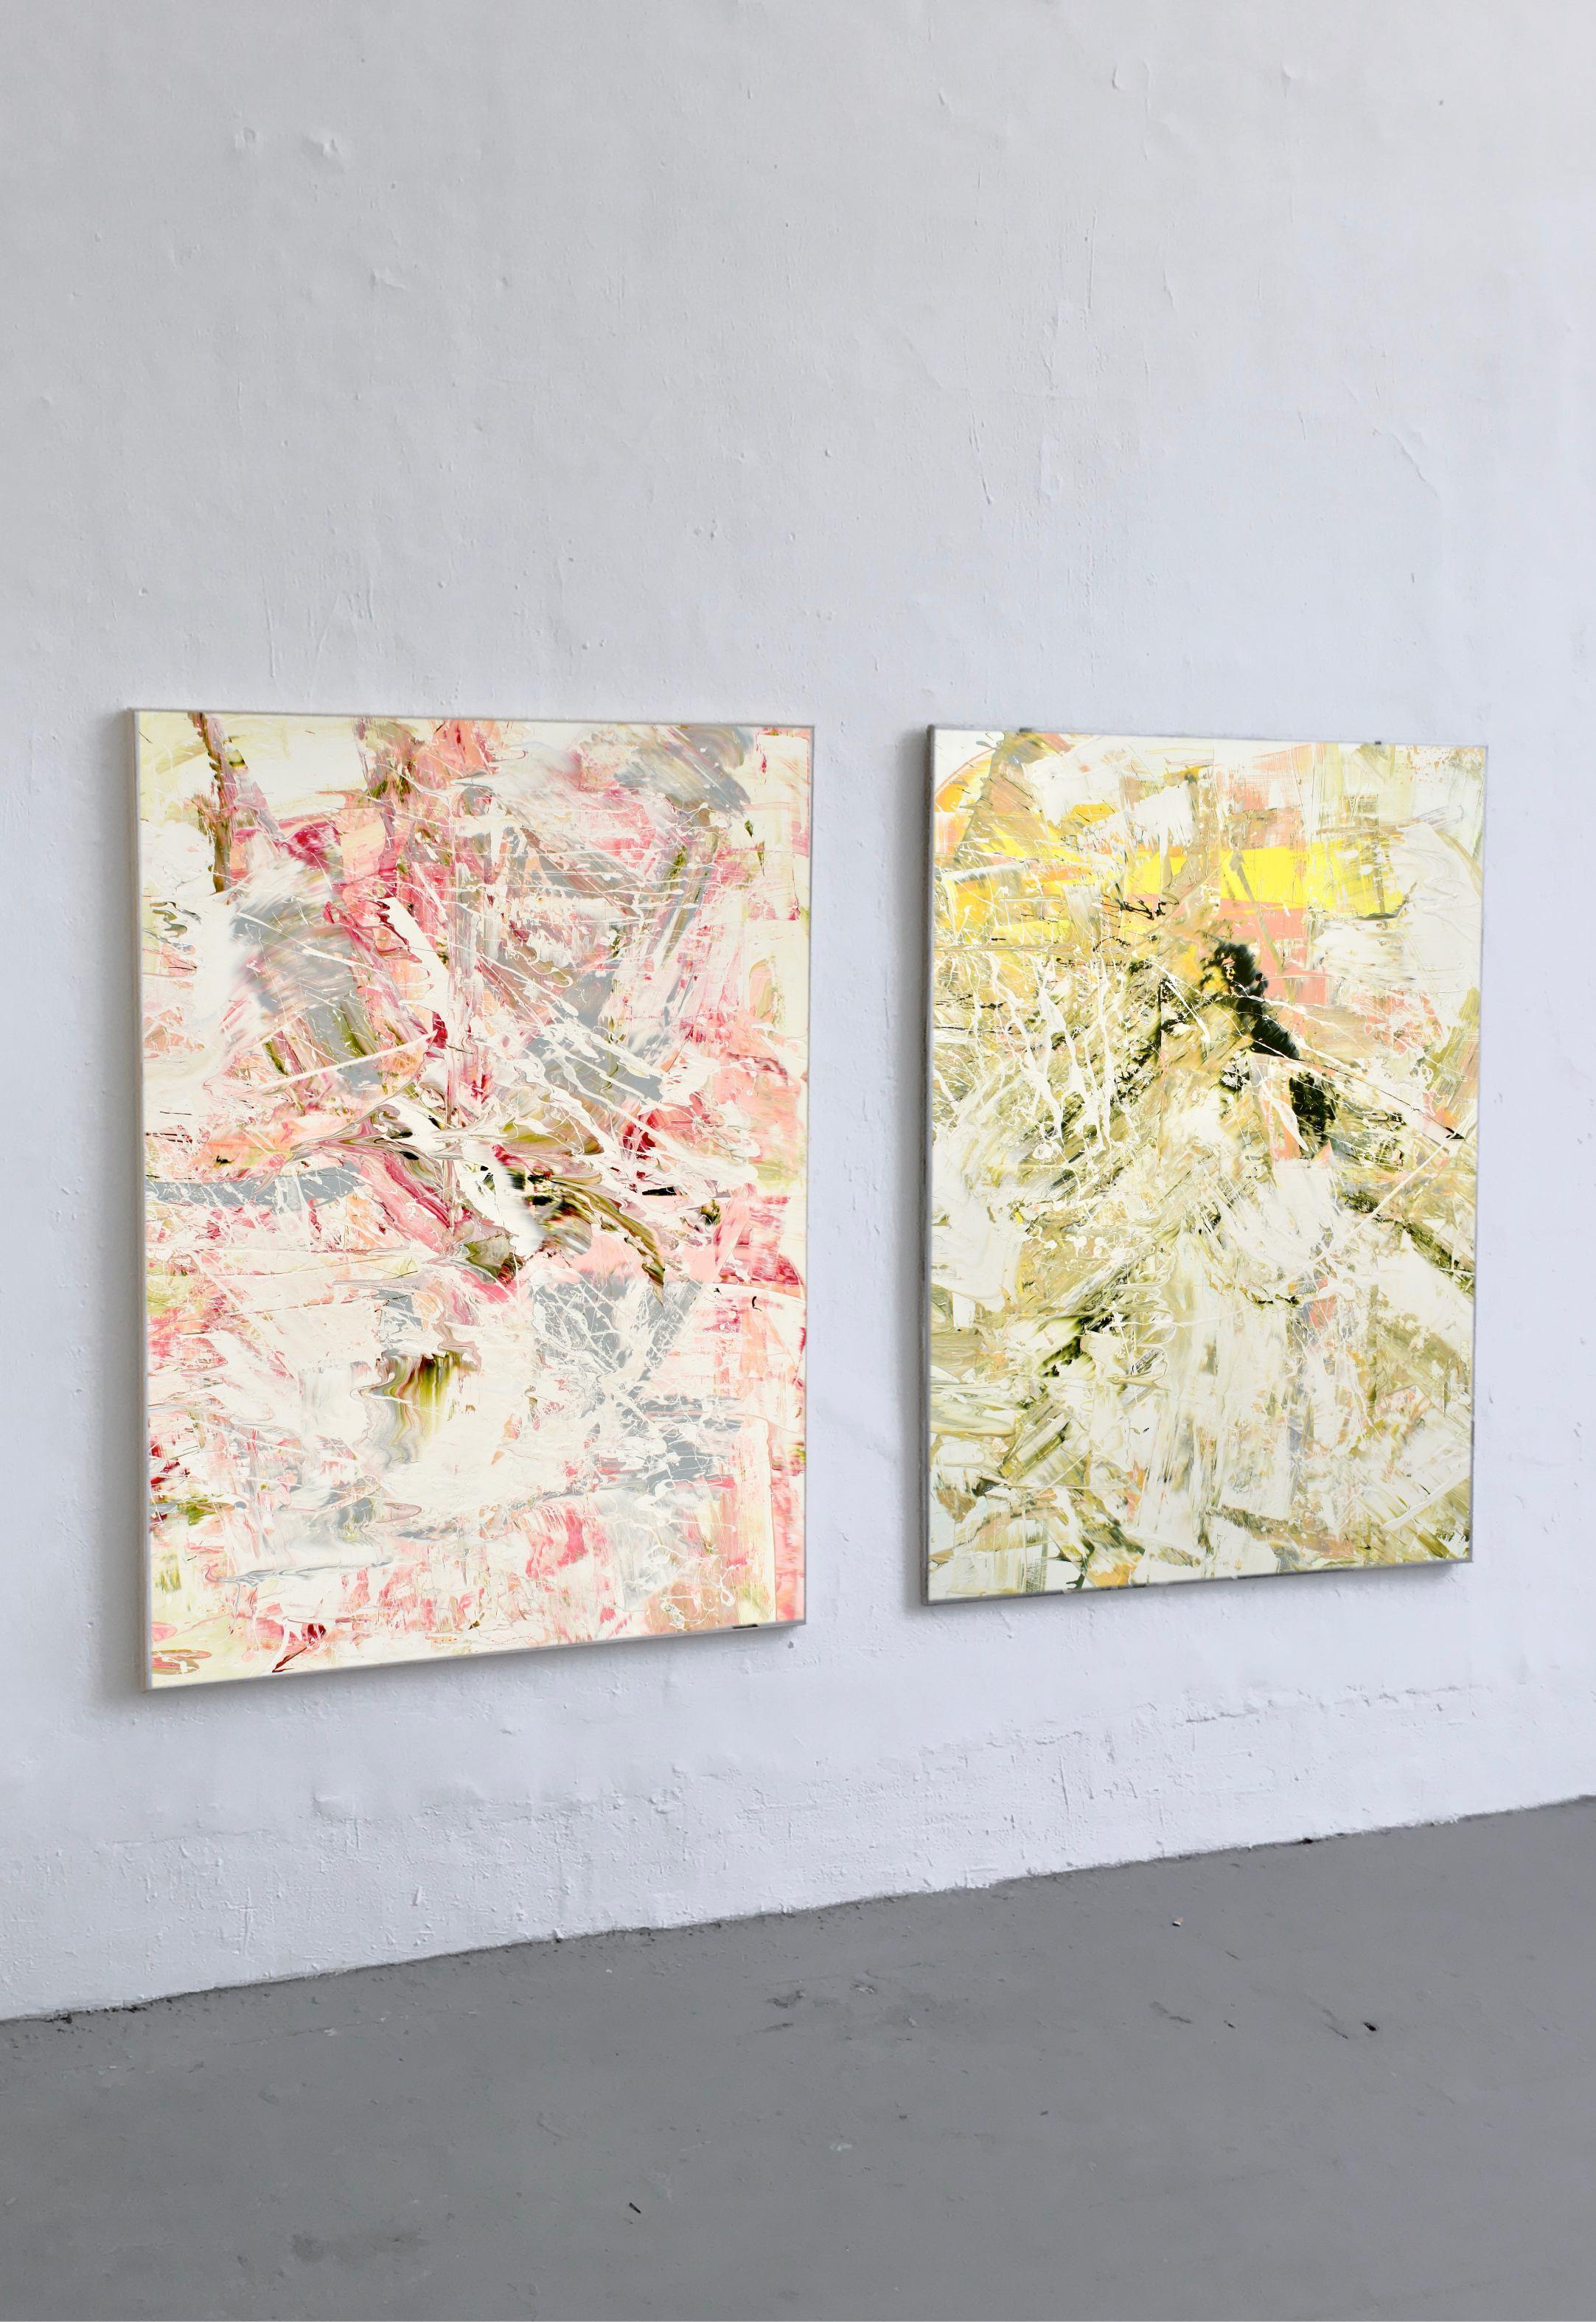 Abstraktes Bild Kunst Artist Ausstellung THERESA KALLRATH BEAUX ART PARIS KUNSTAKADEMIE DÜSSELDORF ARTIST ABSTRAKT RUNDGANG 2018 Oil Painting WALL